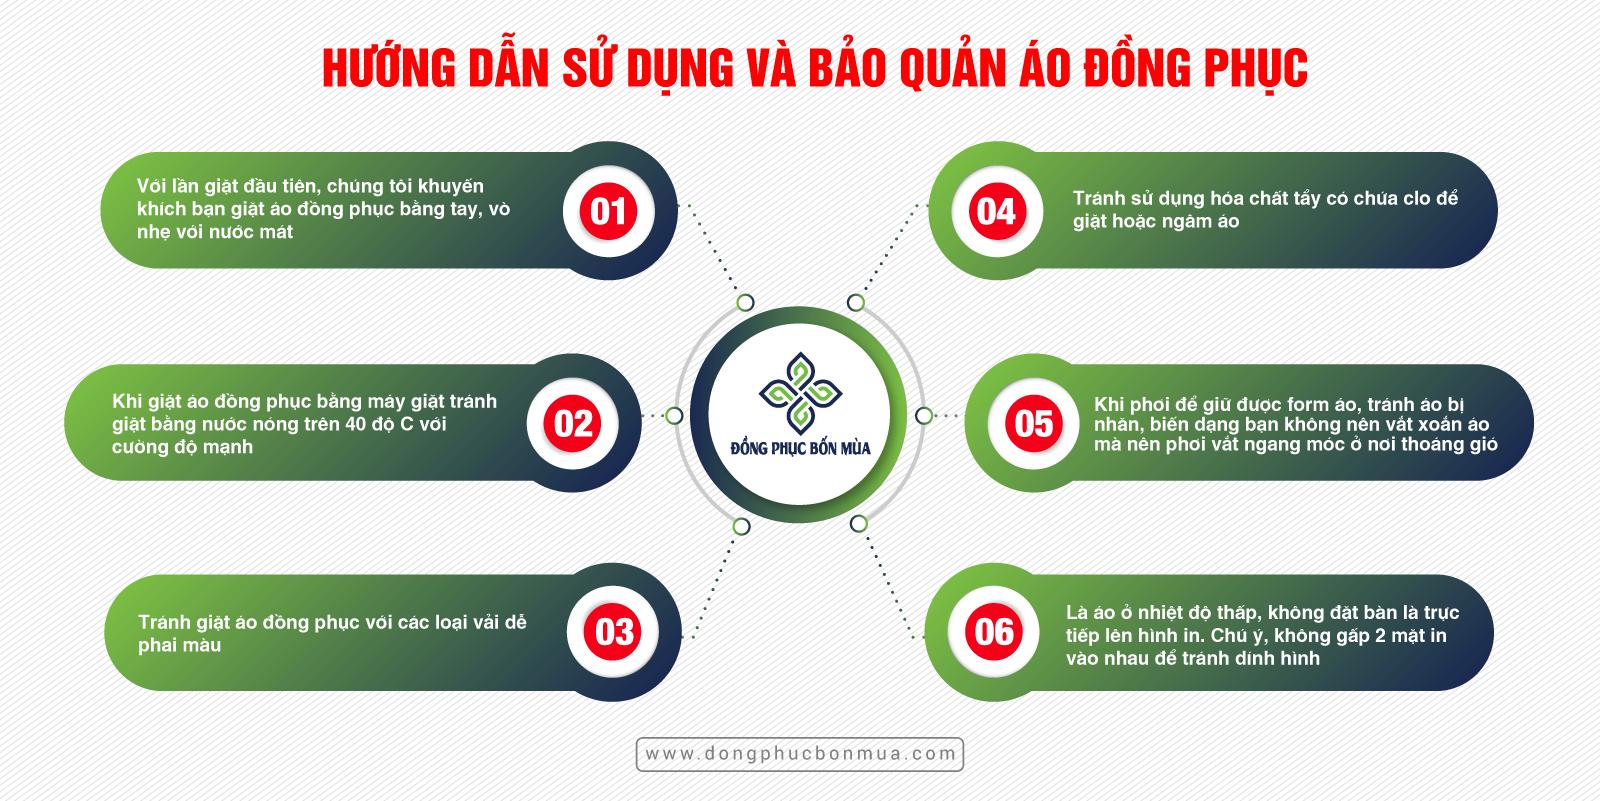 tab huong dan su dung copy 3